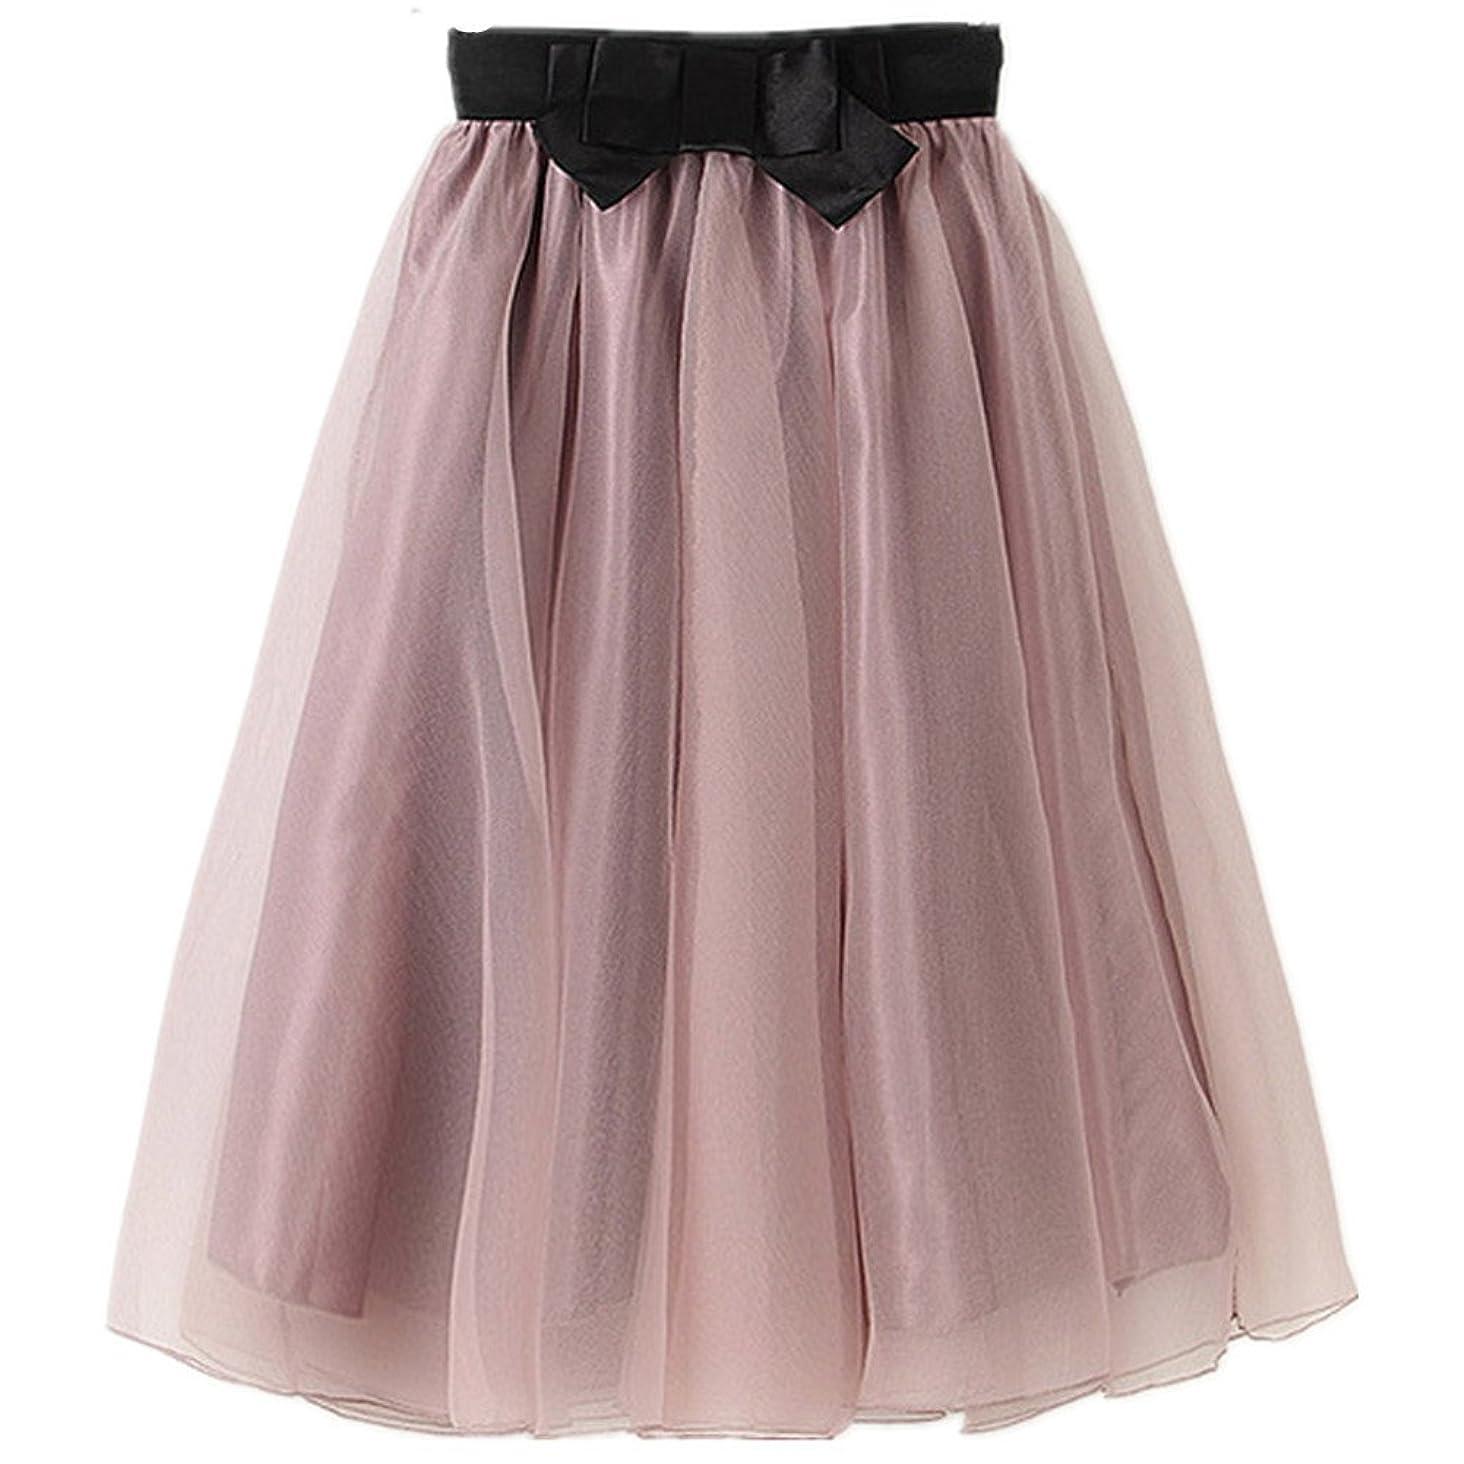 YSJERA Lady's Organza Princess Skirt Bowknot A Line Pleated Midi/Knee Length Tutu Party Skirts